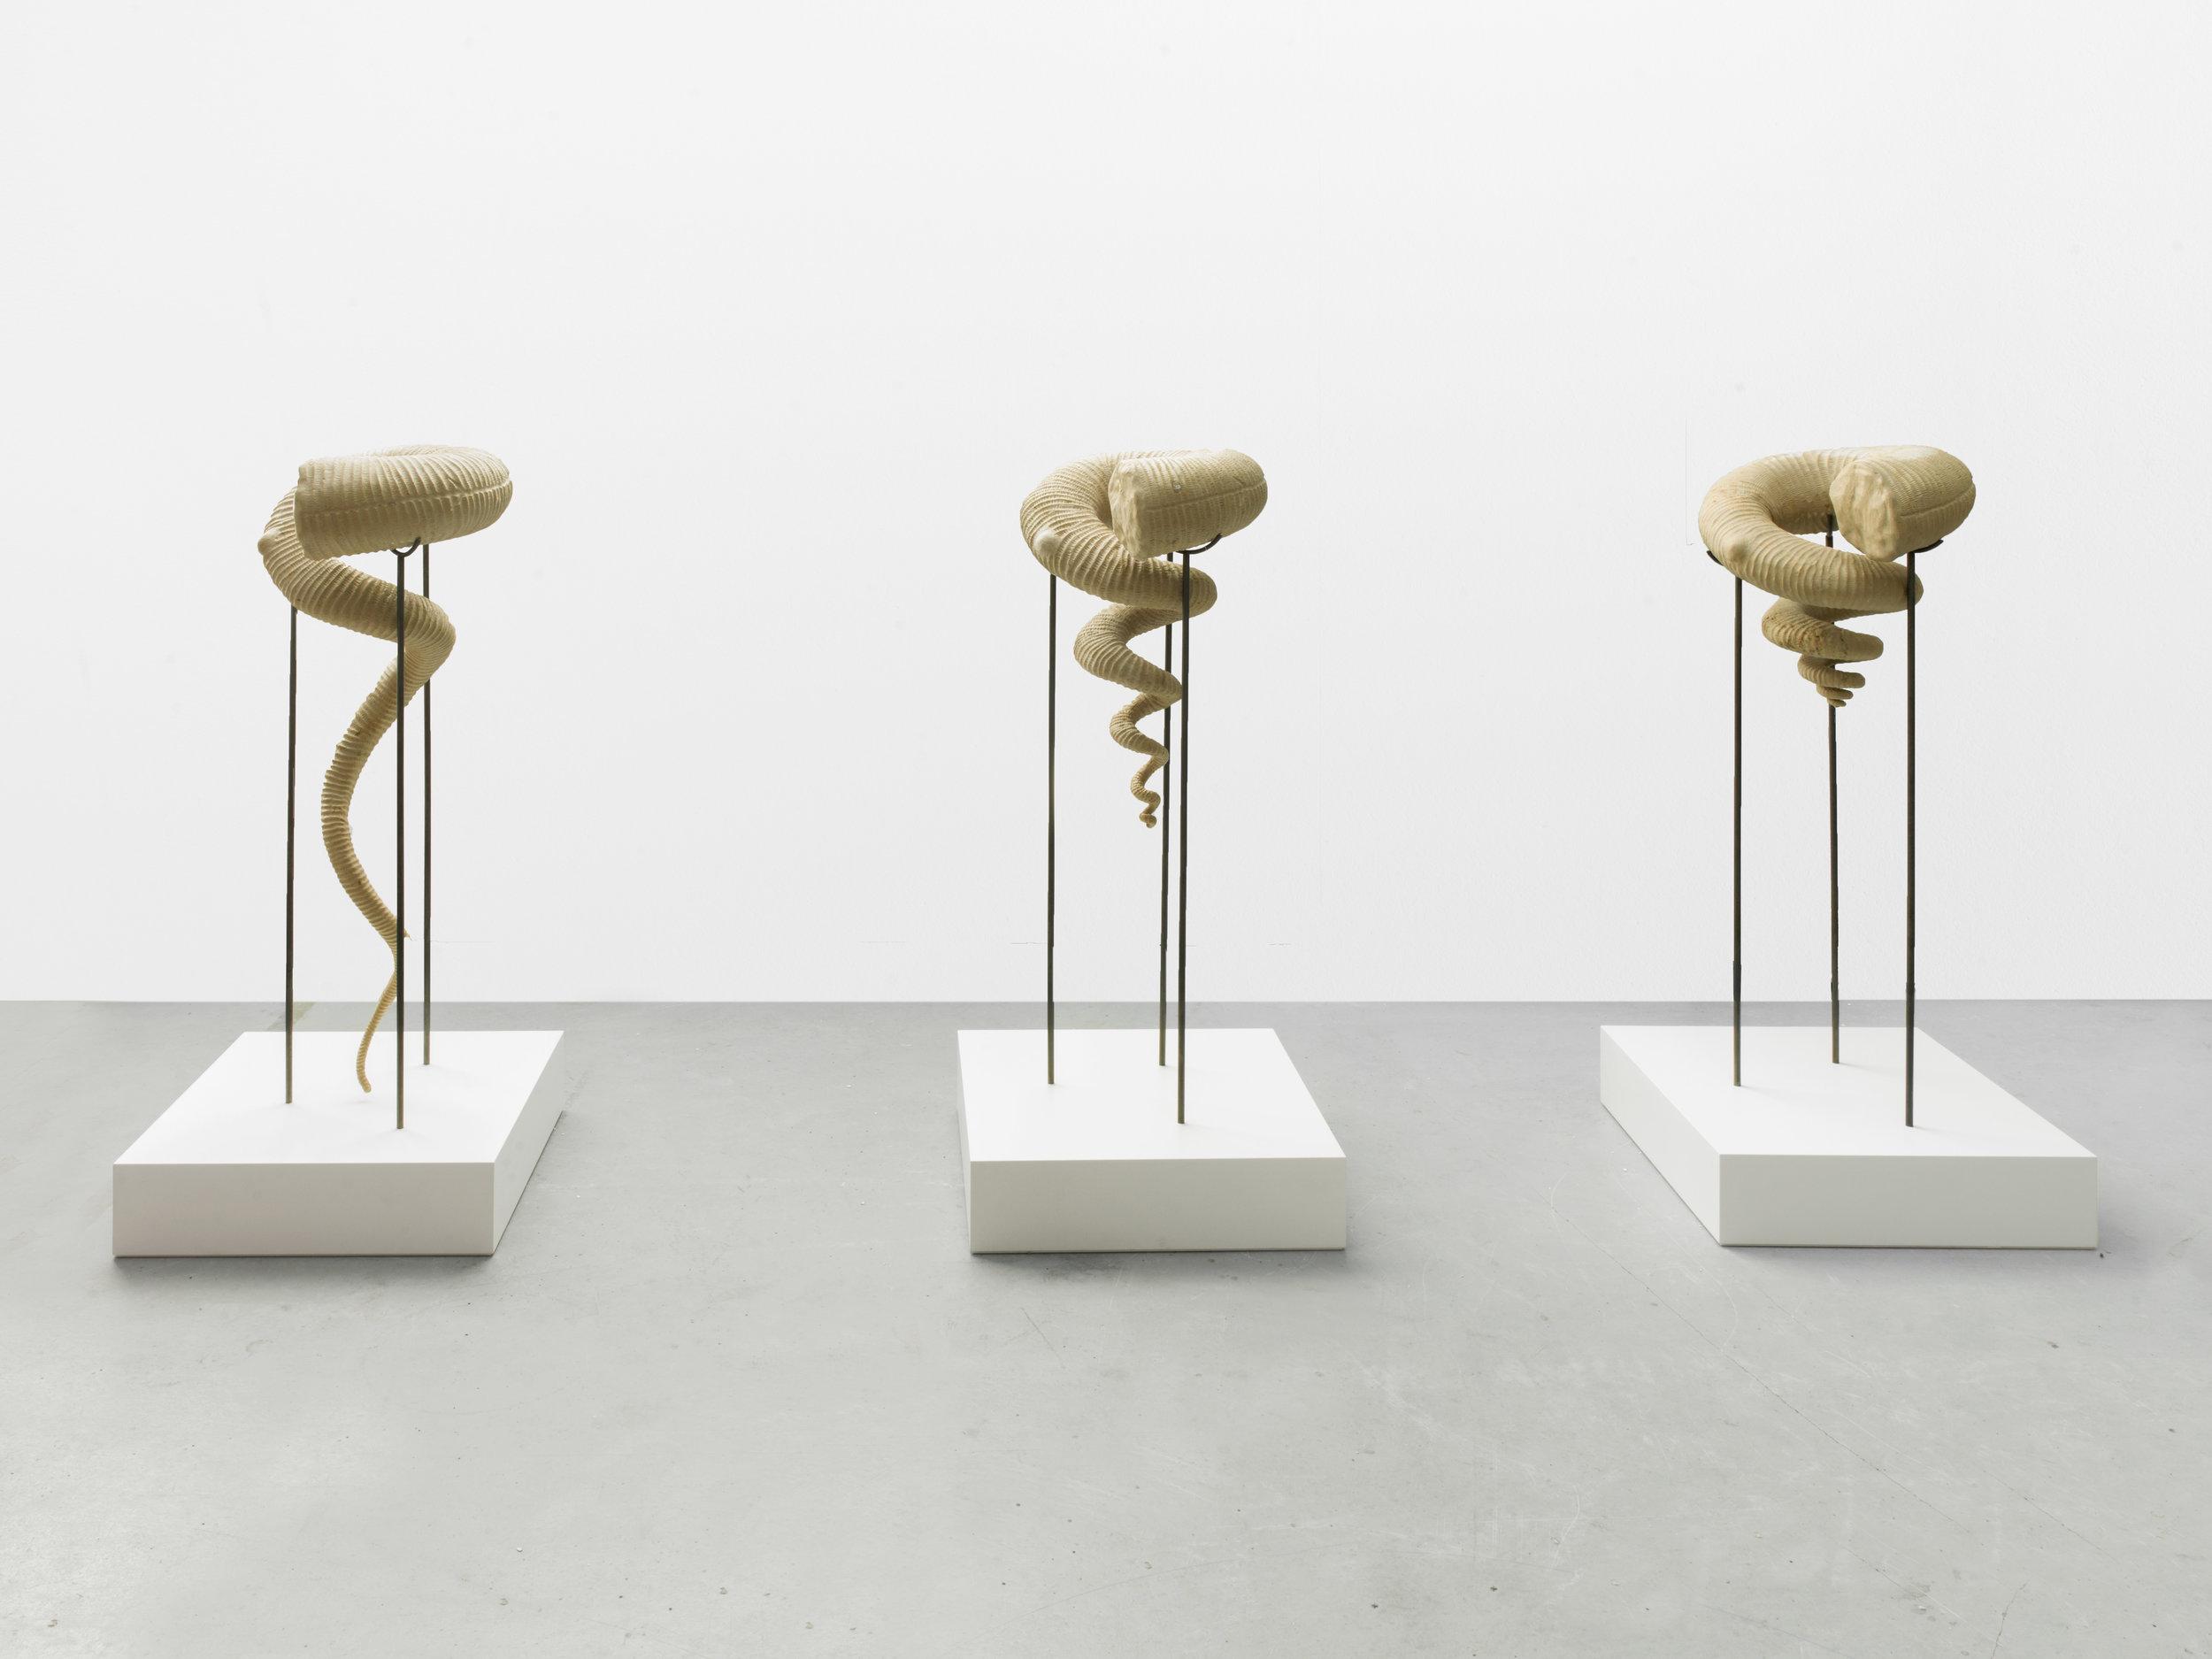 Courtesy of the artist and König Galerie Berlin/London